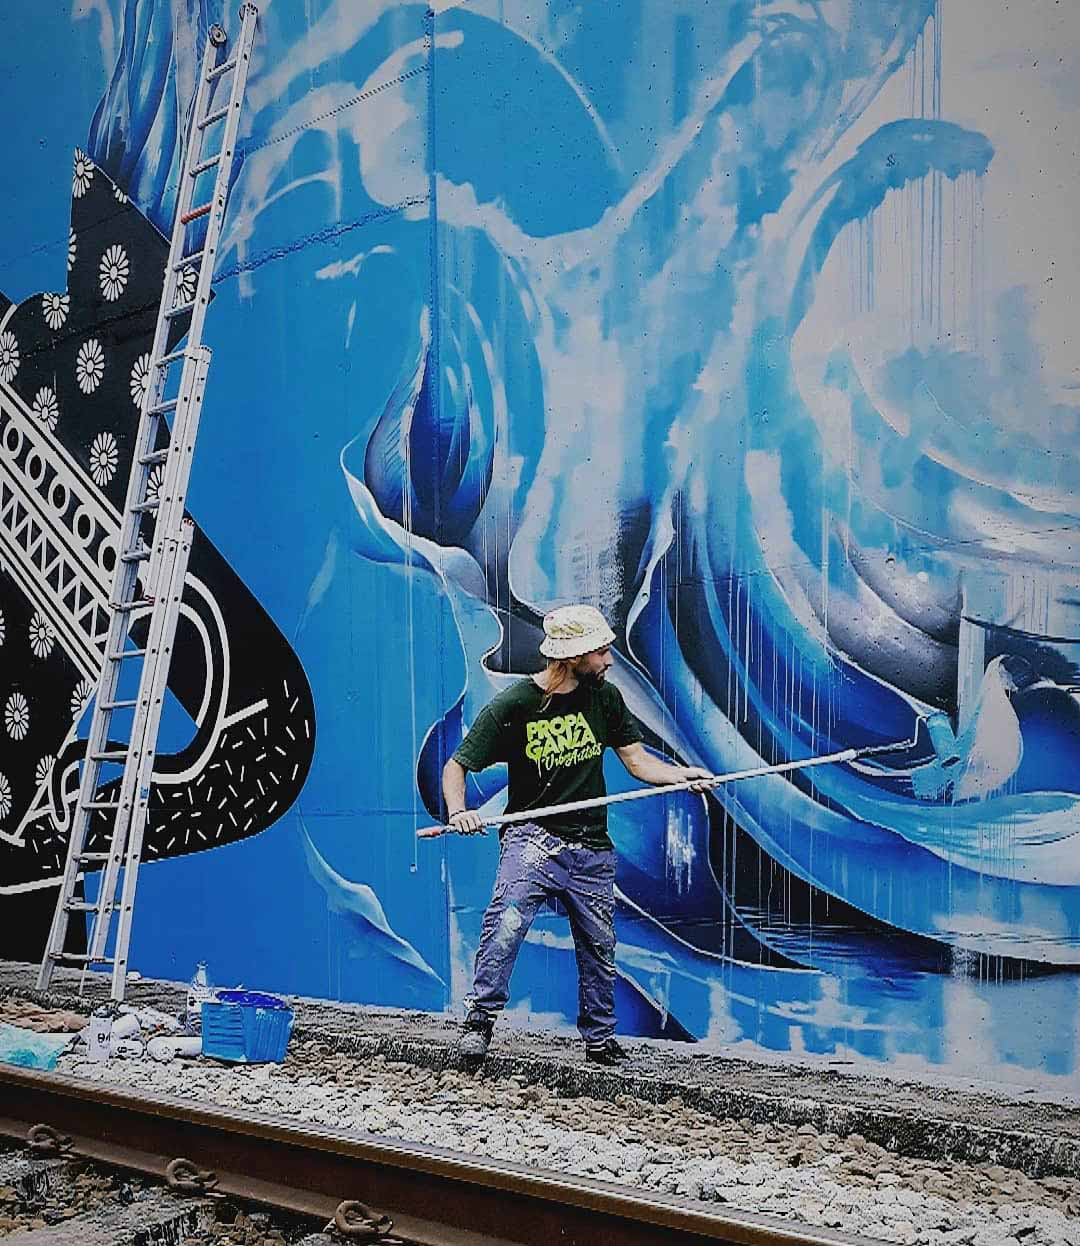 roubens-abstract-street-art-spray-paint-organic-contemporary-vegetal-wave-smoke-clouds-natural-belgium_22